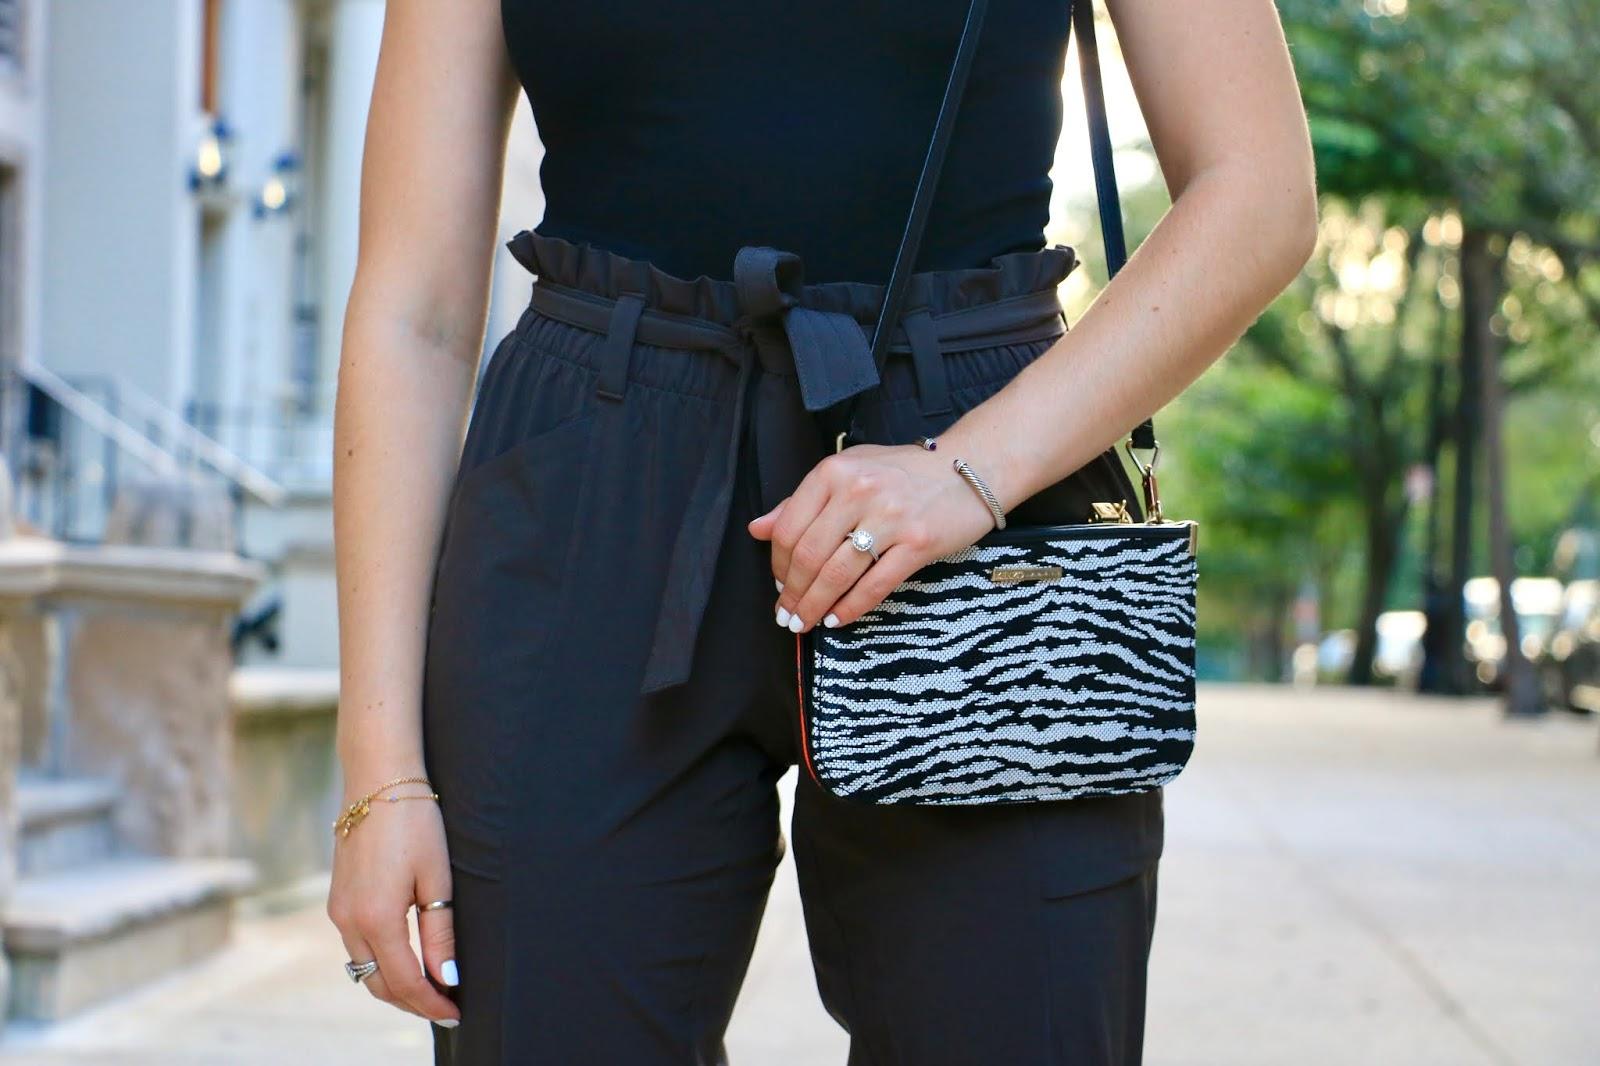 Nyc fashion blogger Kathleen Harper wearing paper bag pants from Athleta.